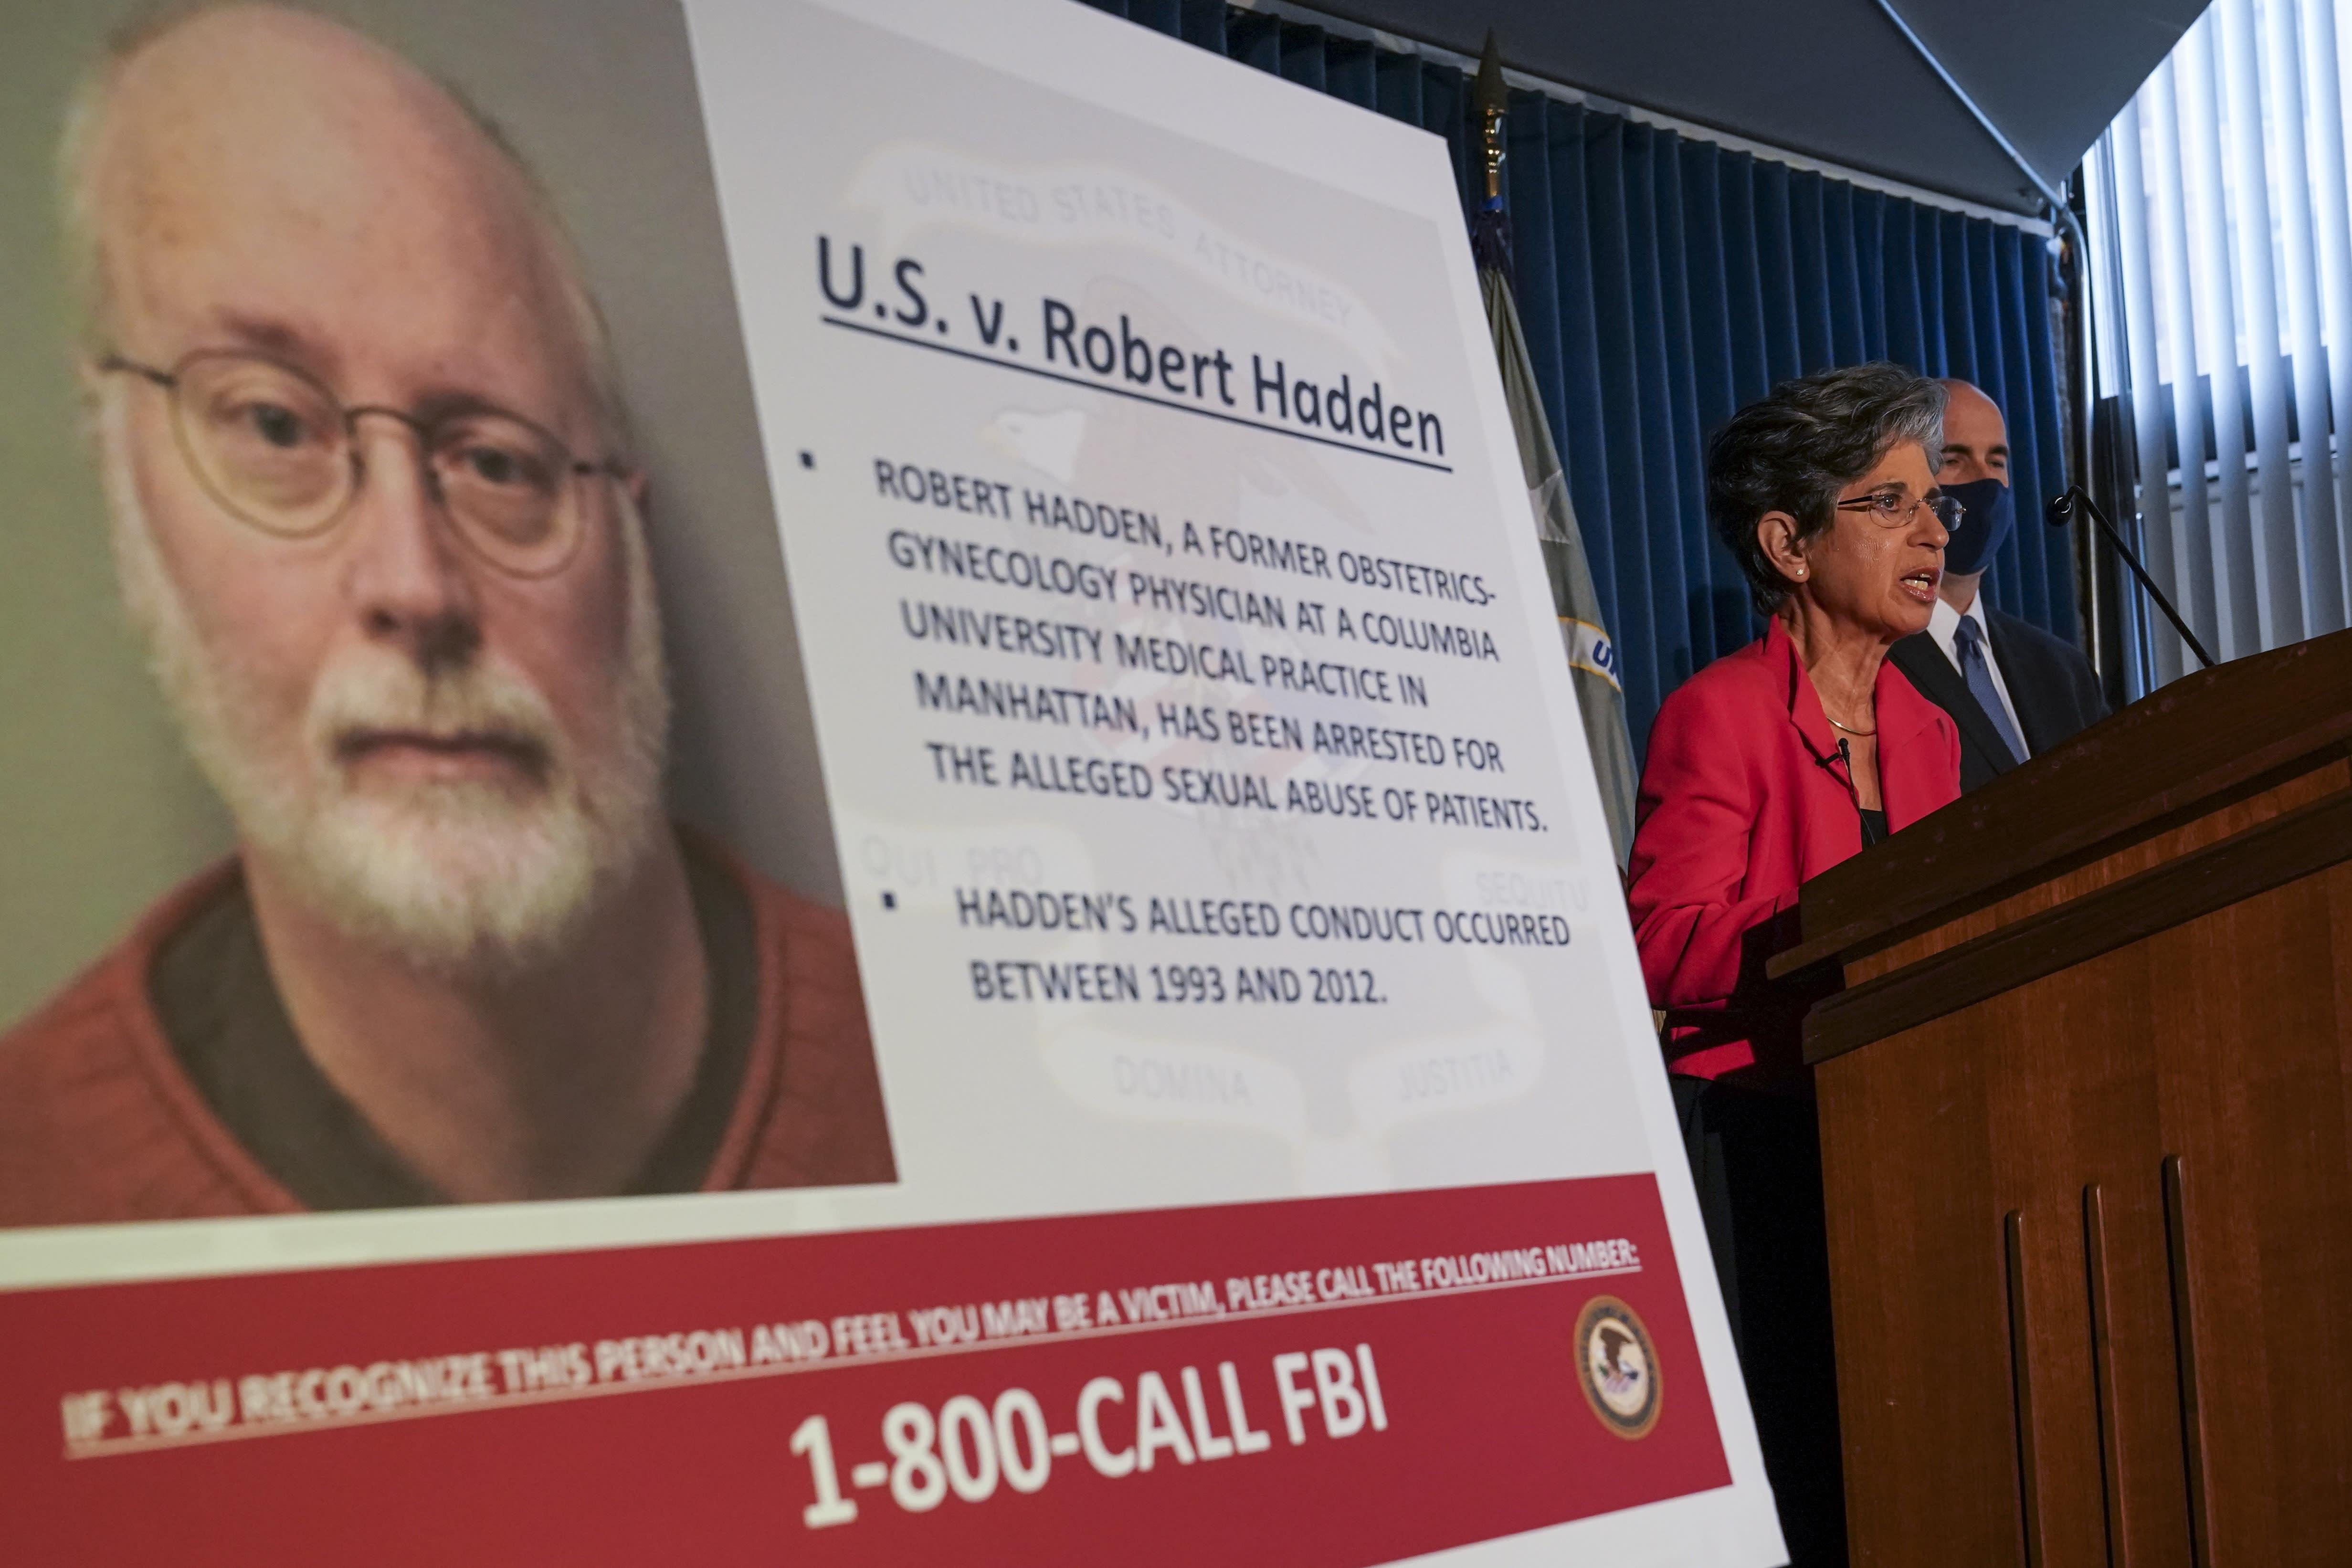 Manhattan Gynecologist Robert Hadden Accused of Molesting Dozens of Patients